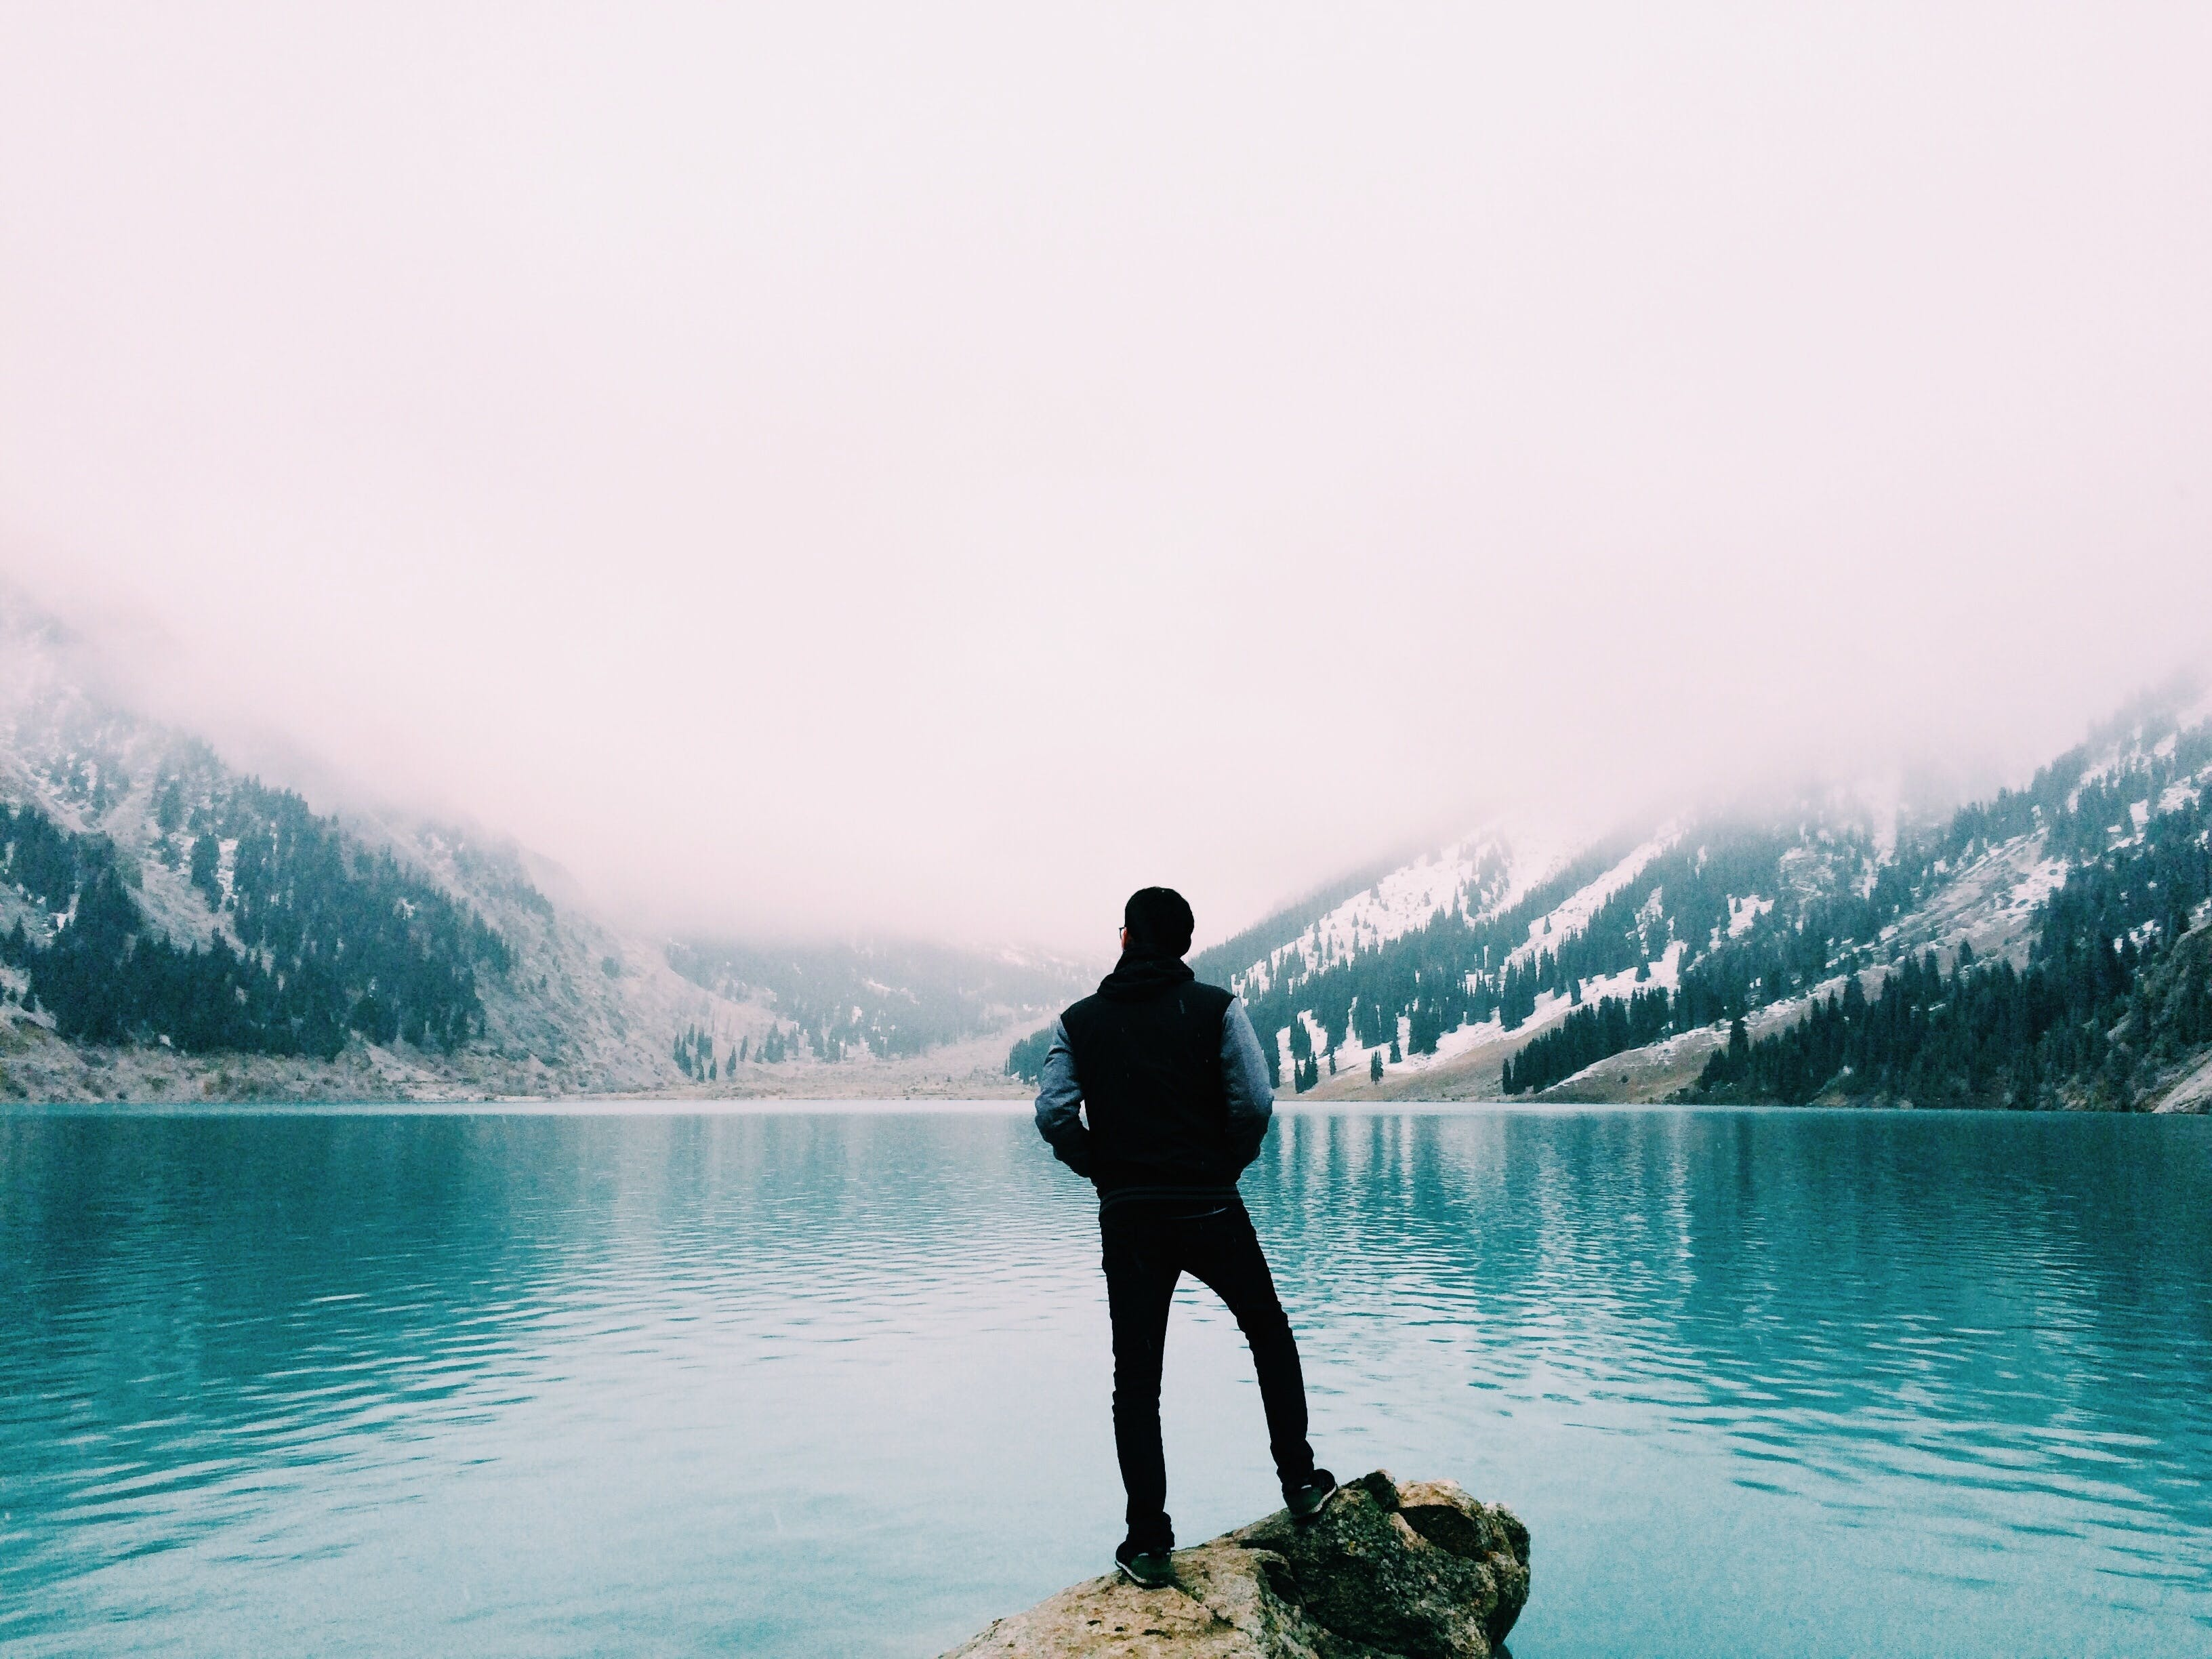 Free stock photo of nature, man, water, mountain